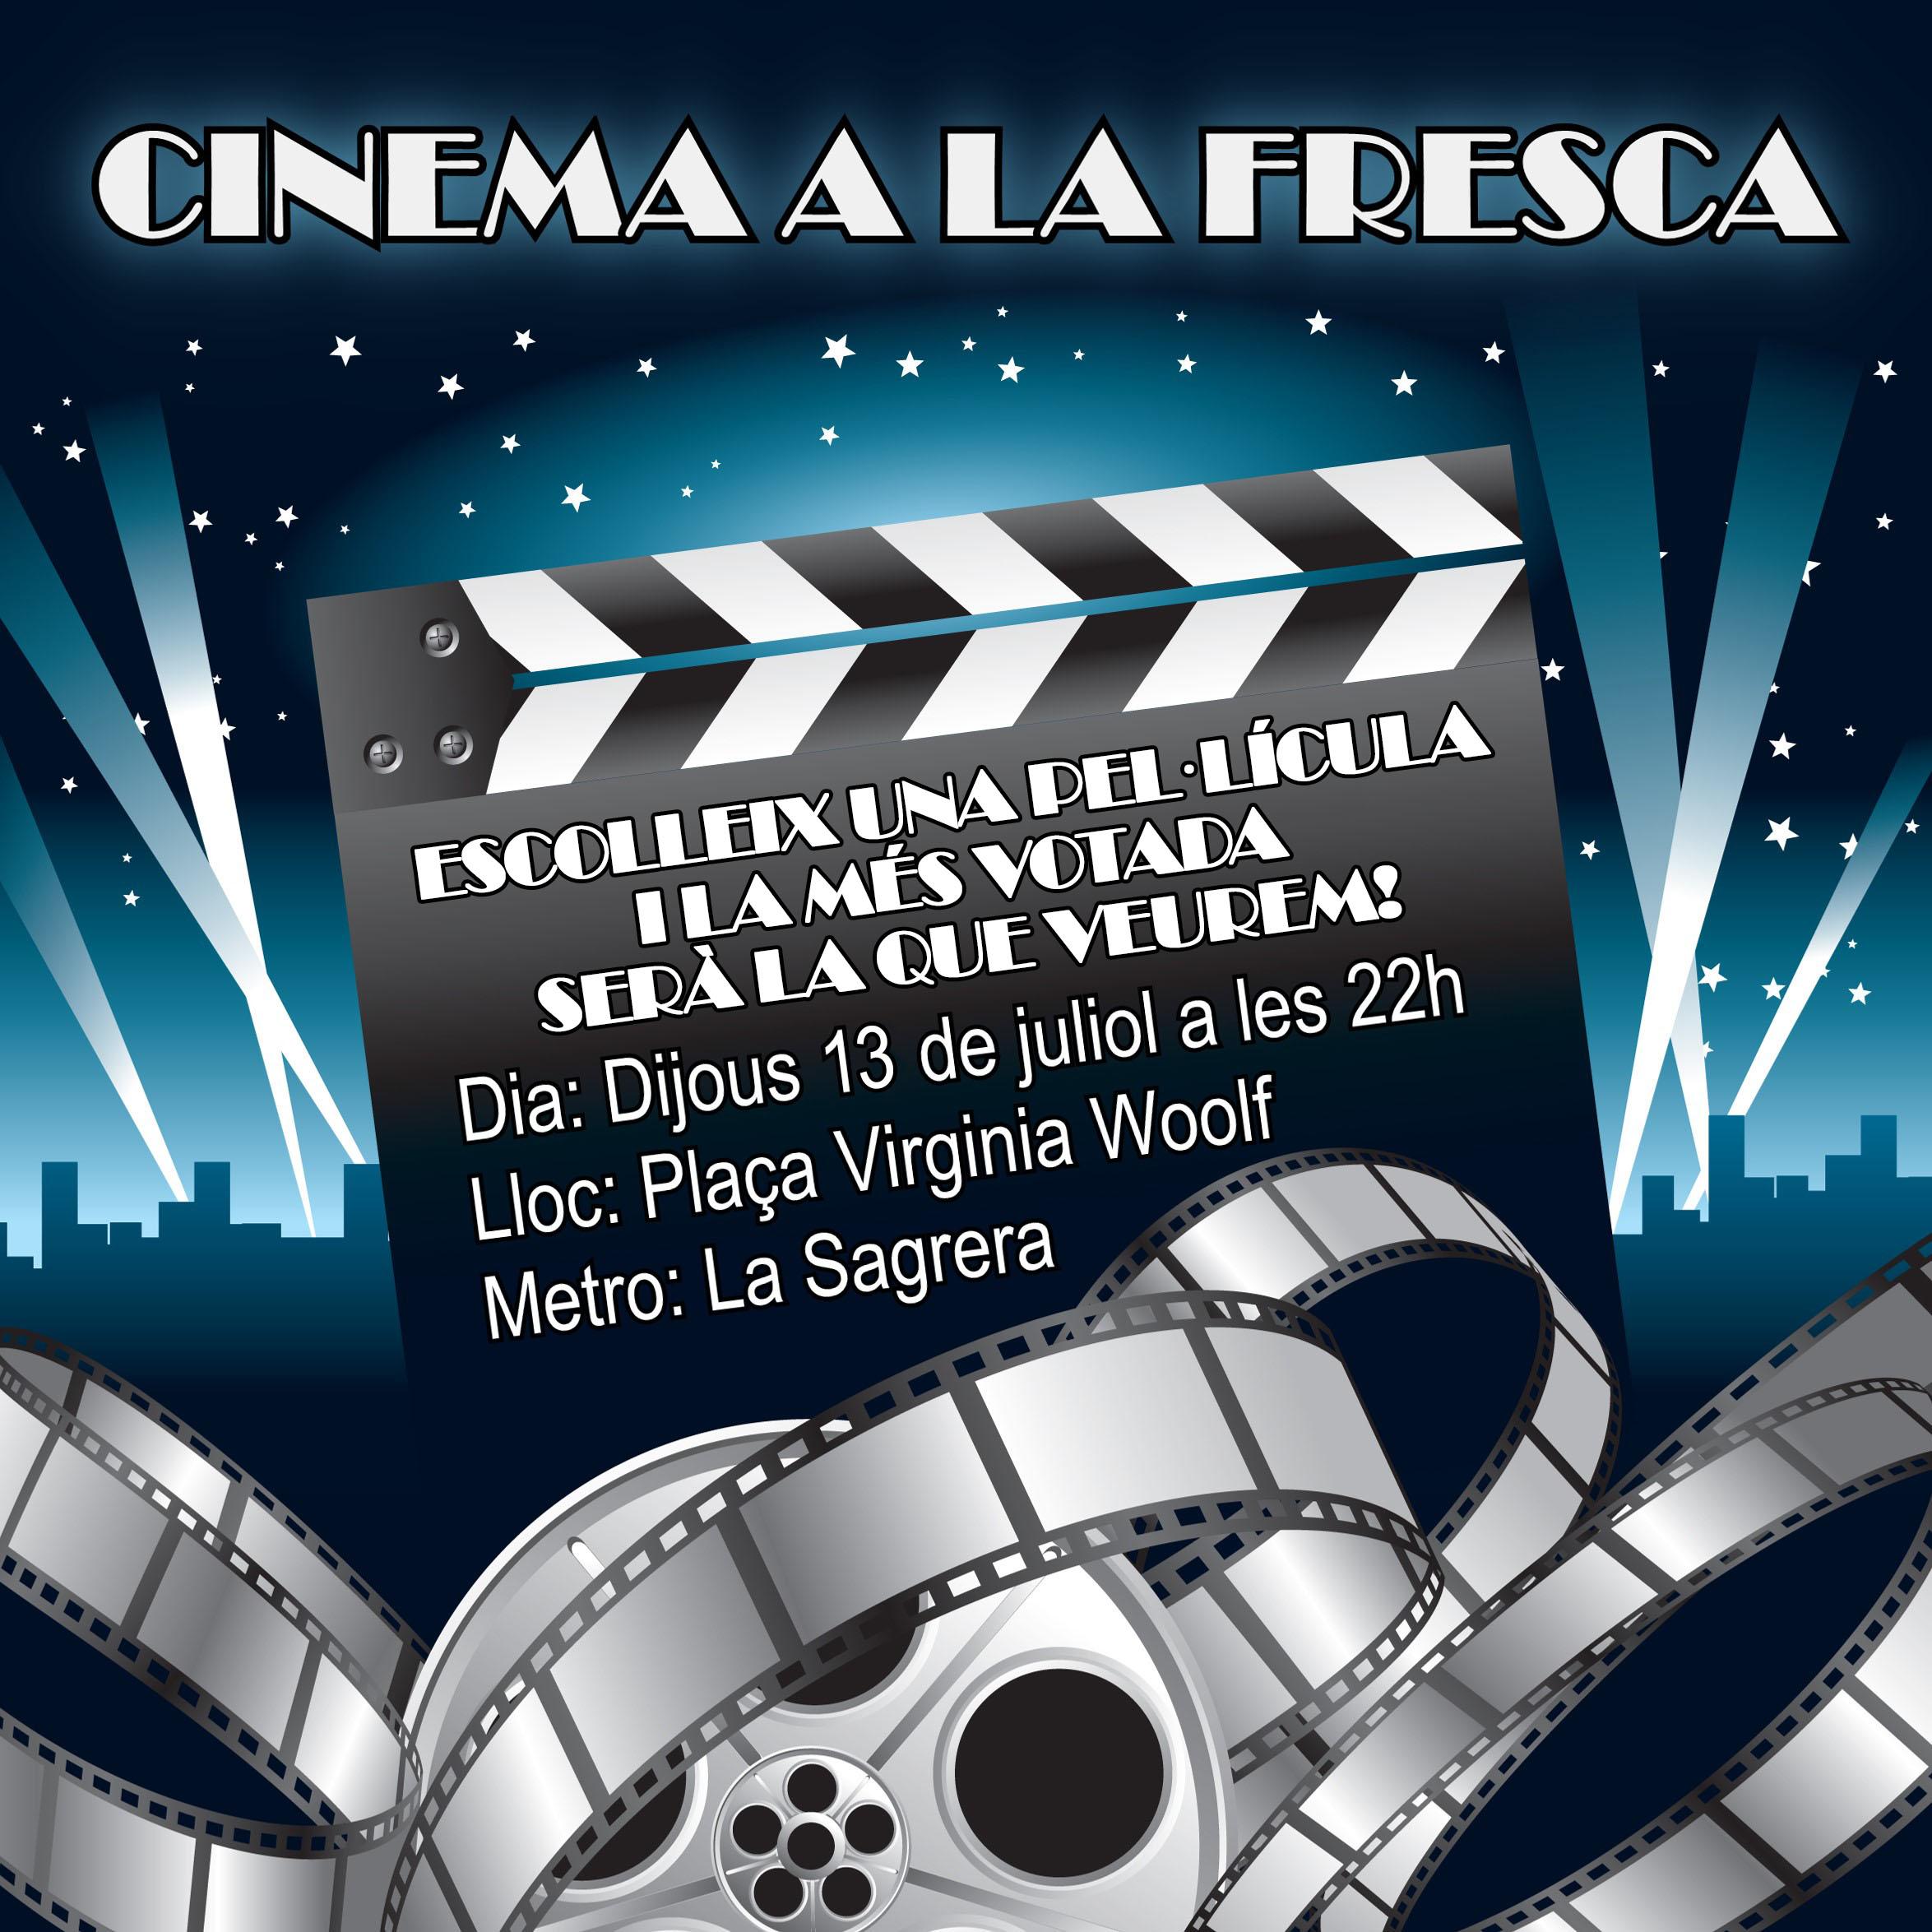 Vota una pel·lícula de Cinema a la fresca!